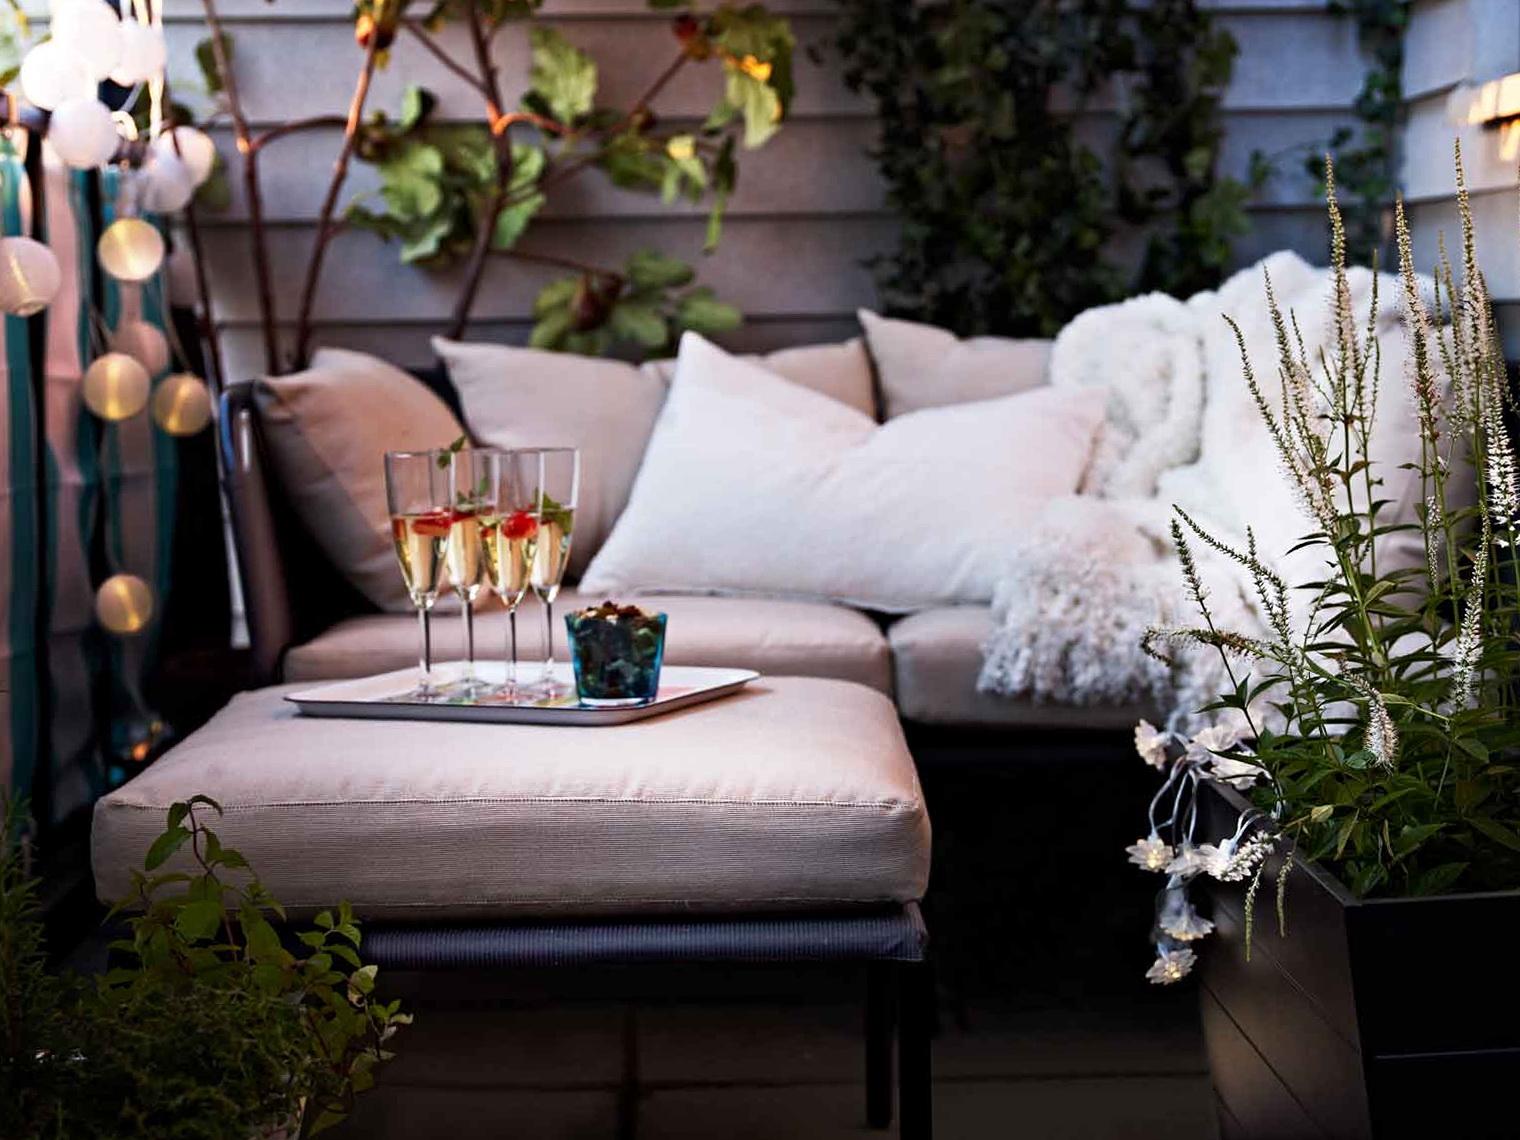 Ikea Patio Furniture Review